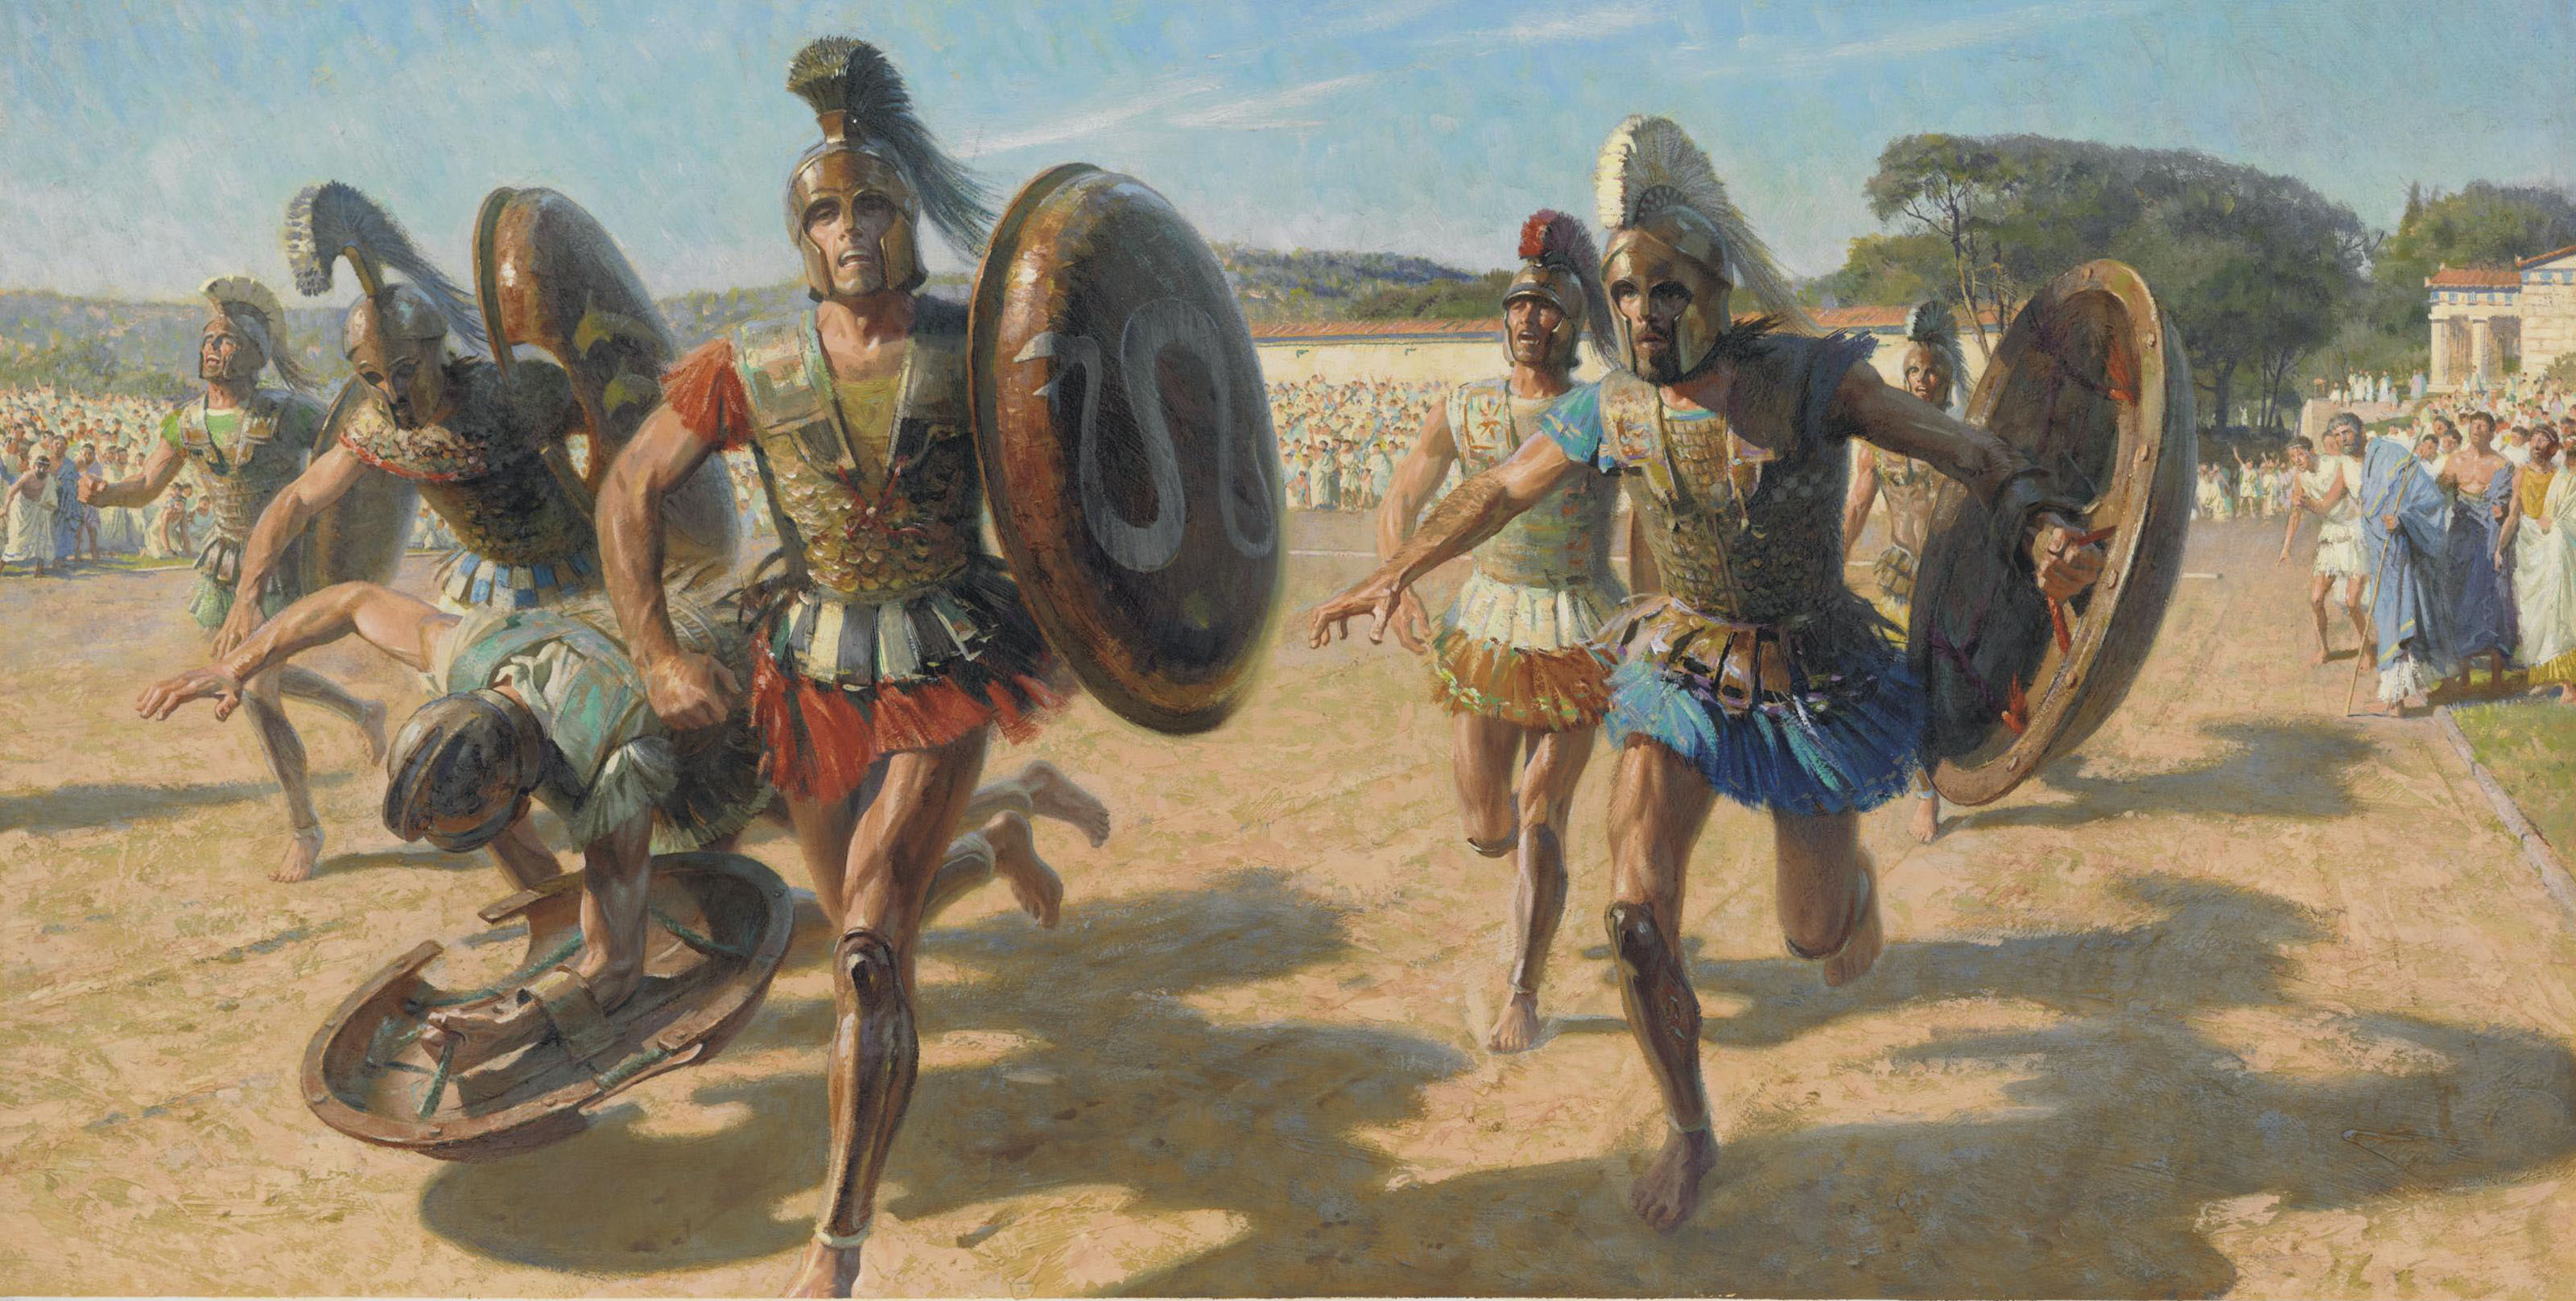 Gladiators Race for Fame